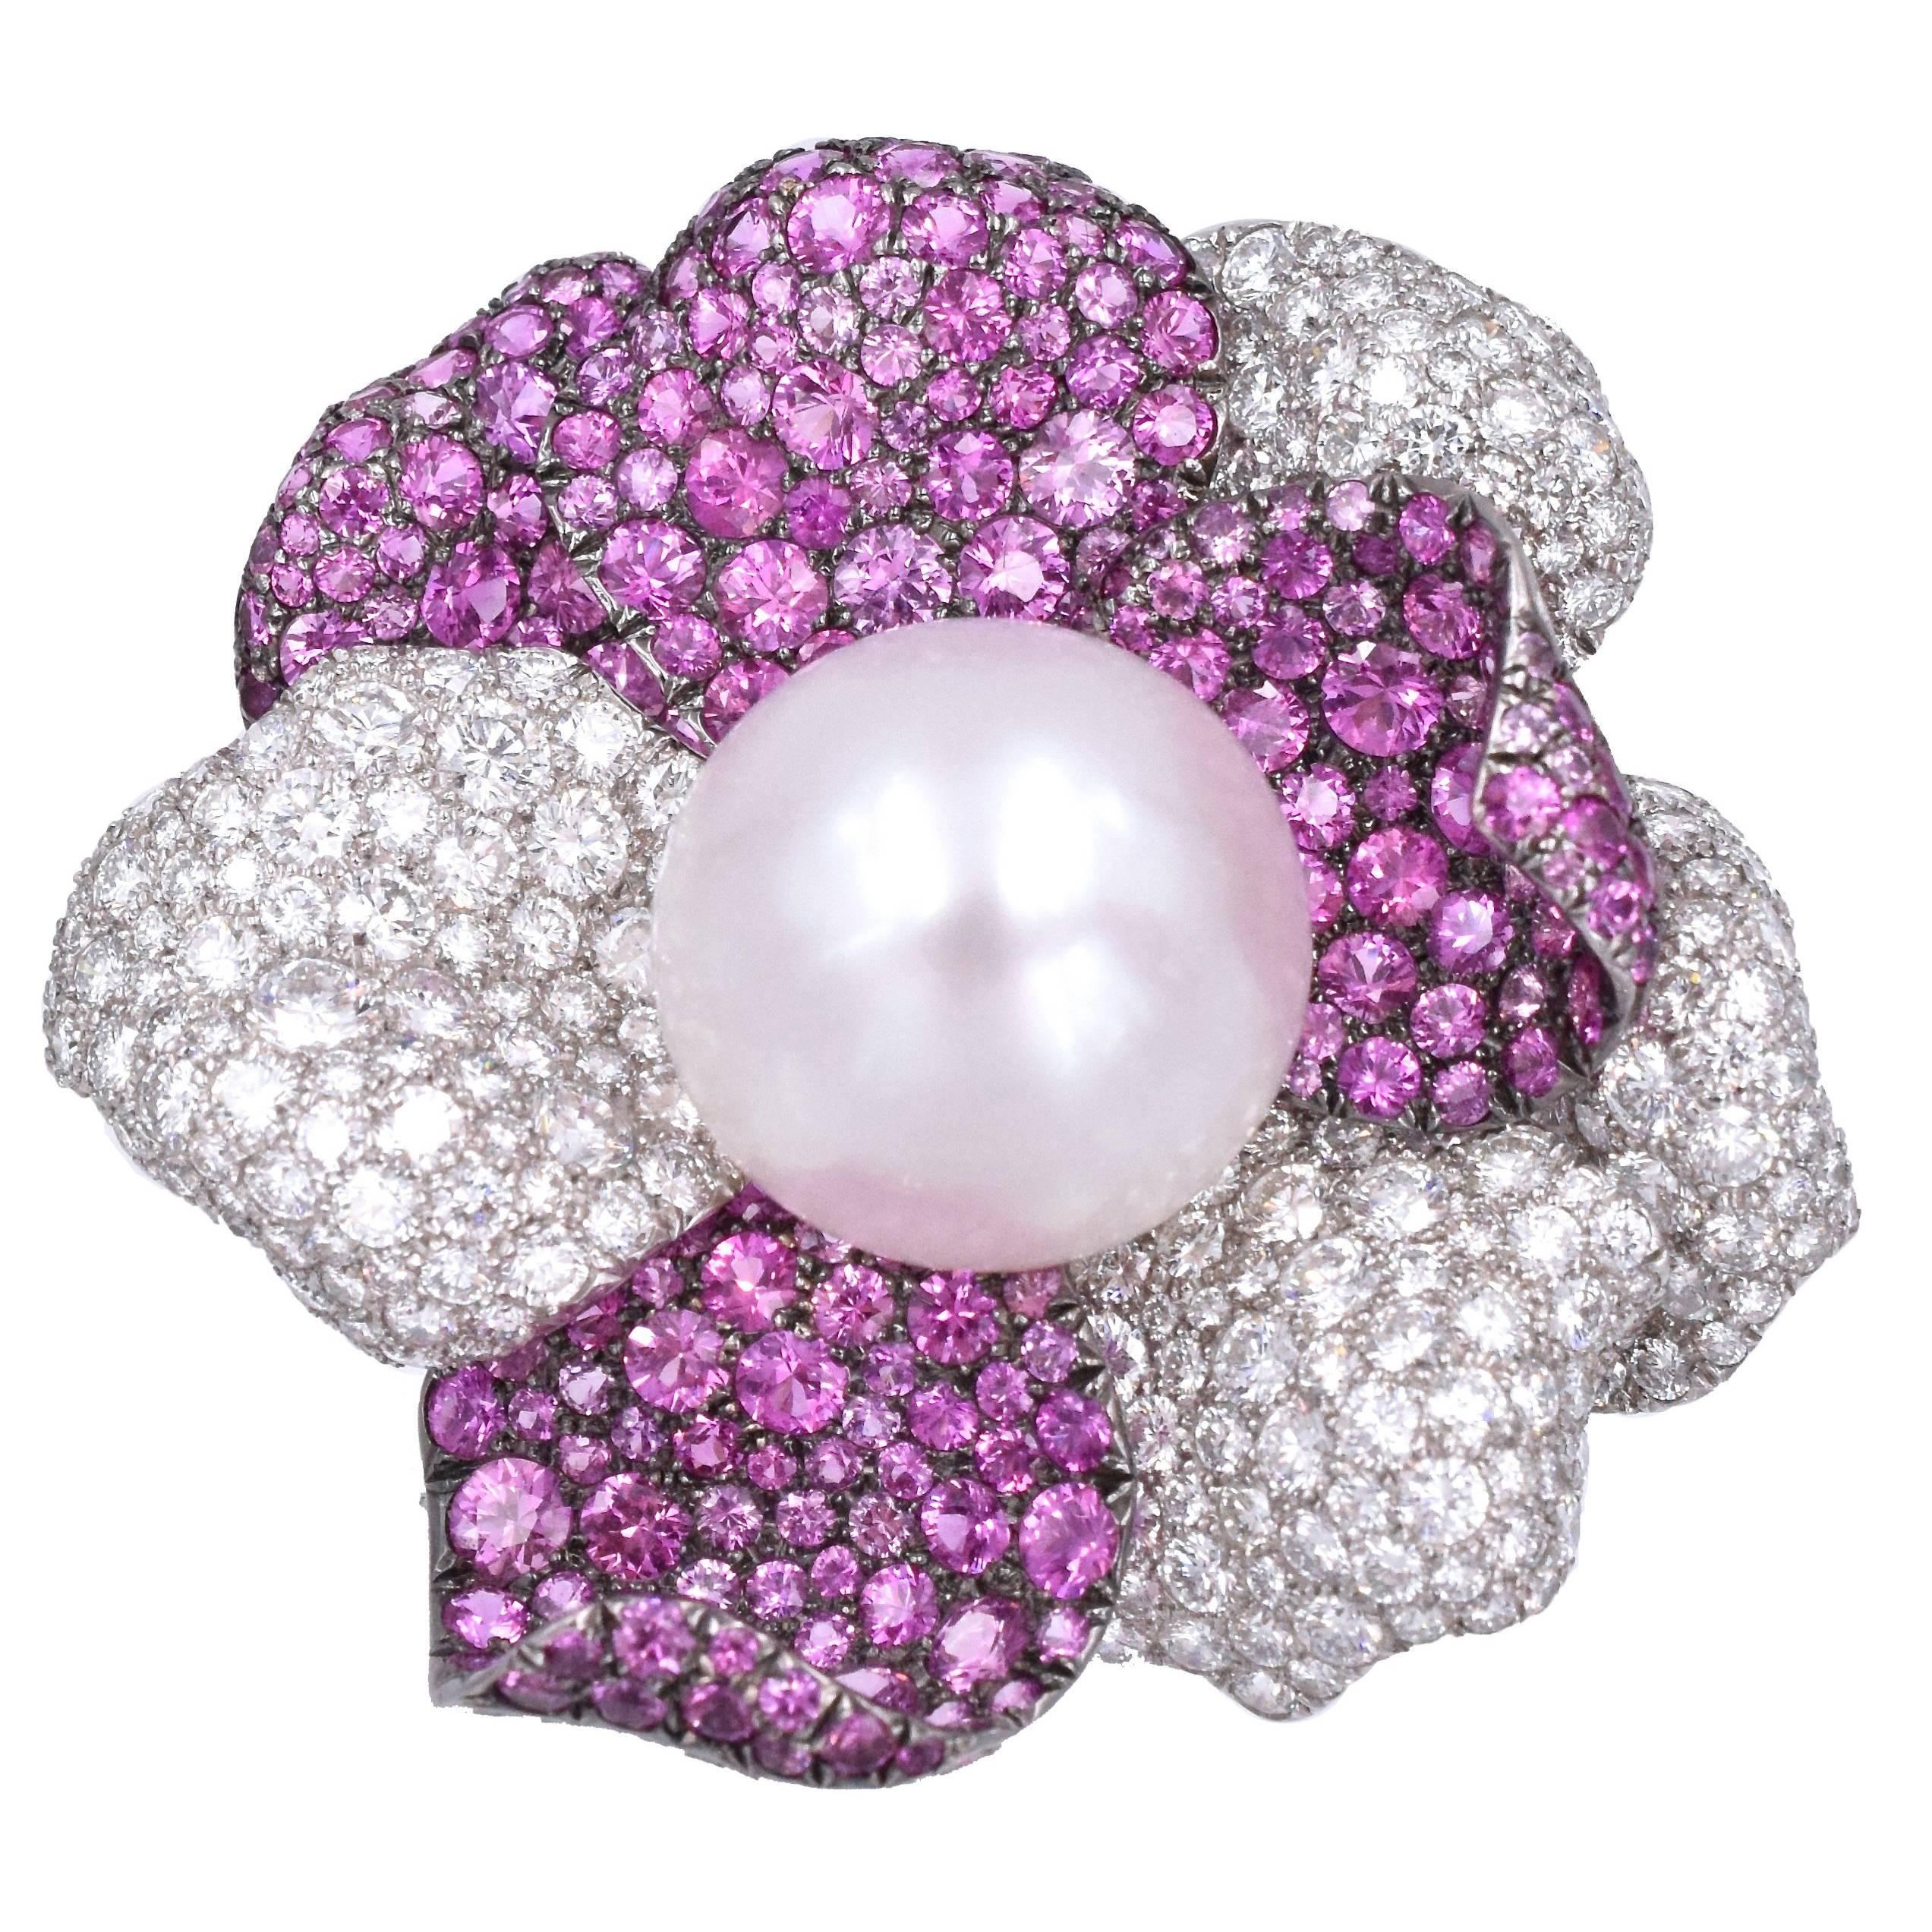 De Grisogono Pearl, Diamond and Pink Sapphire Brooch